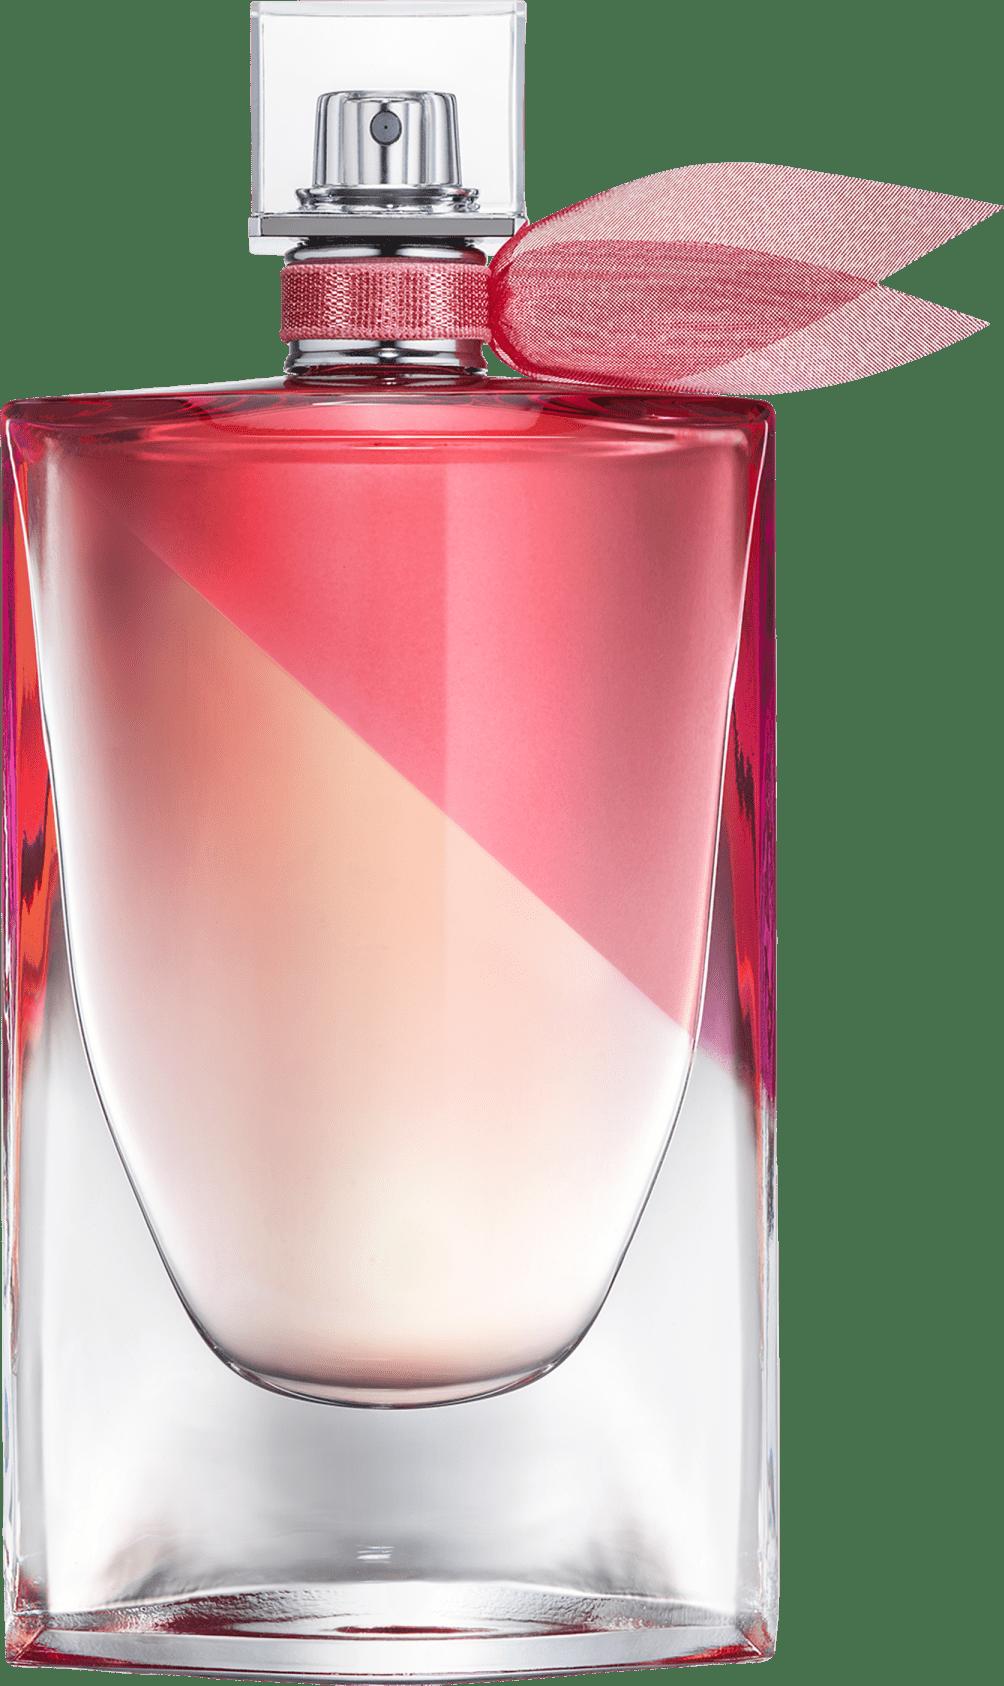 b17f1b4d62 La Vie Est Belle En Rose Lancôme Eau de Toilette - Perfume Feminino 100ml